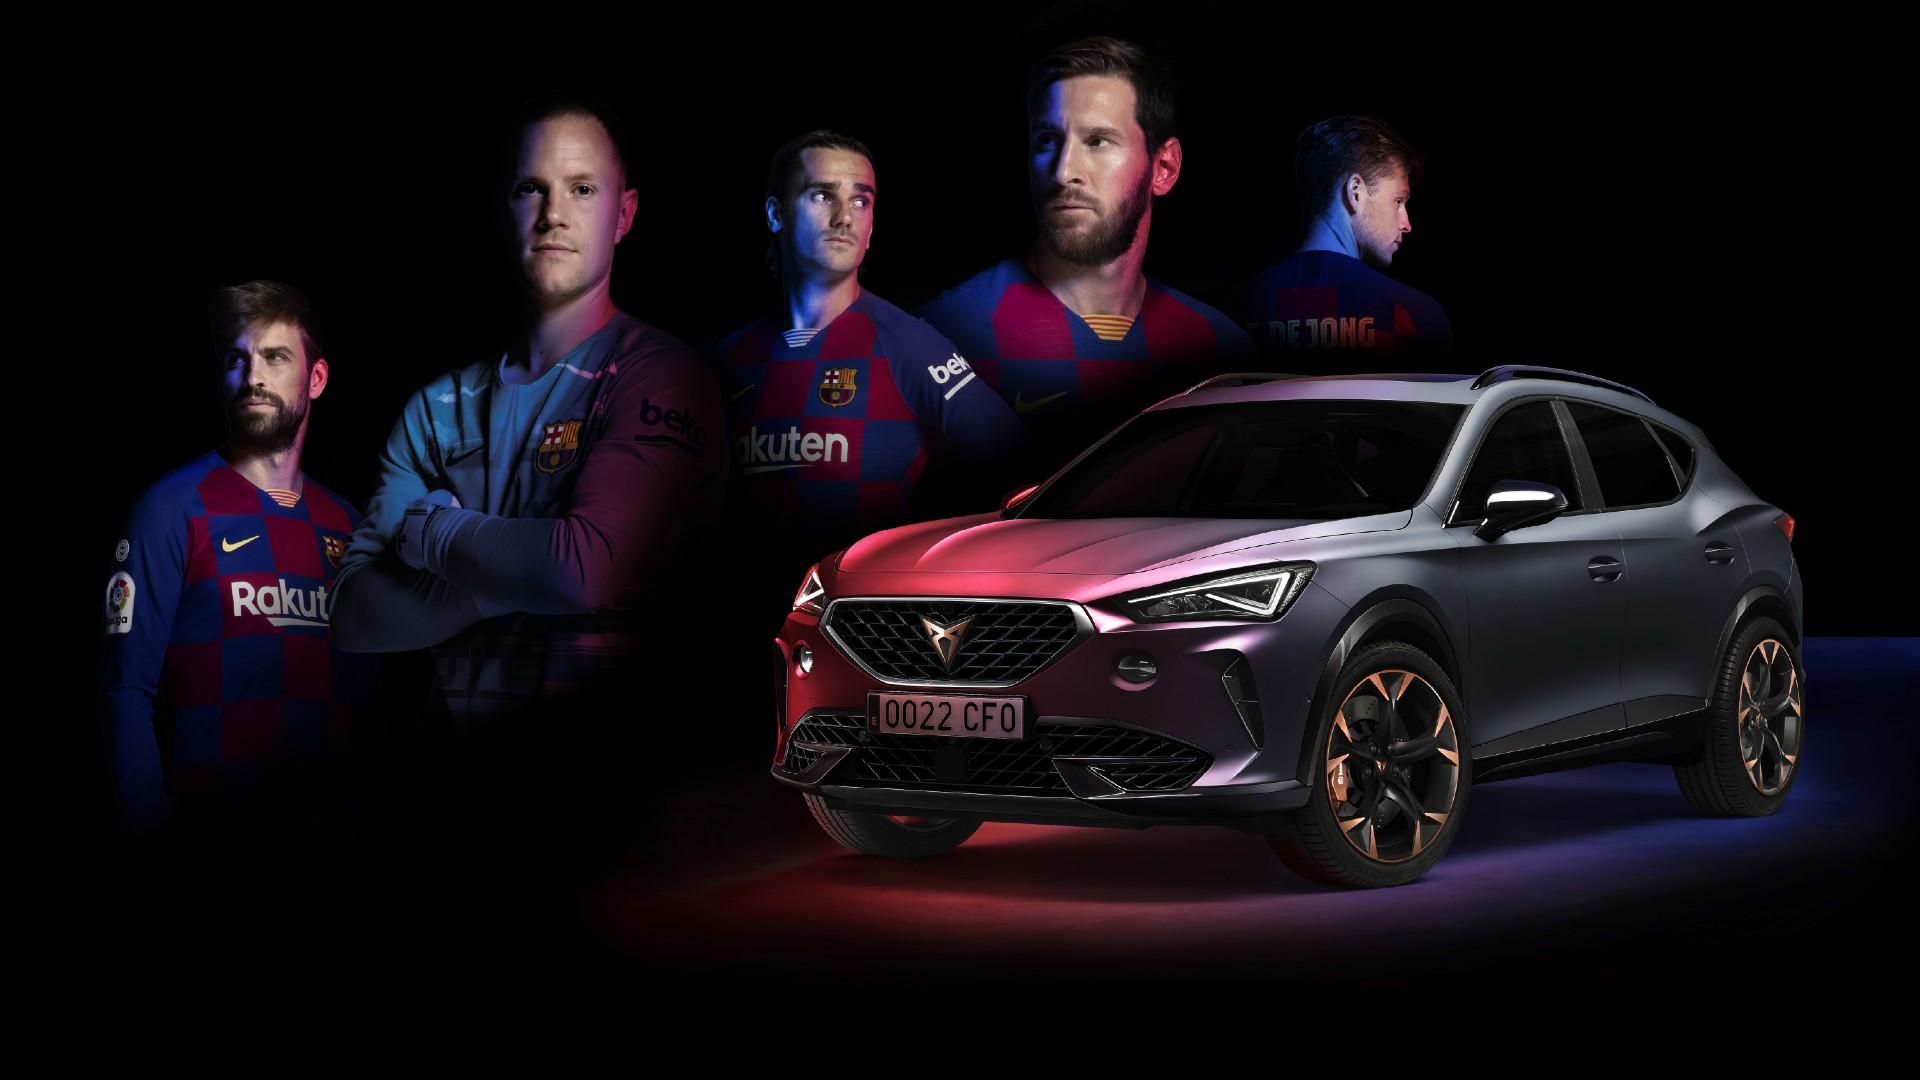 H ποδοσφαιρική ομάδα της Μπαρτσελόνα απέκτησε το δικό της αυτοκίνητο! [vid]